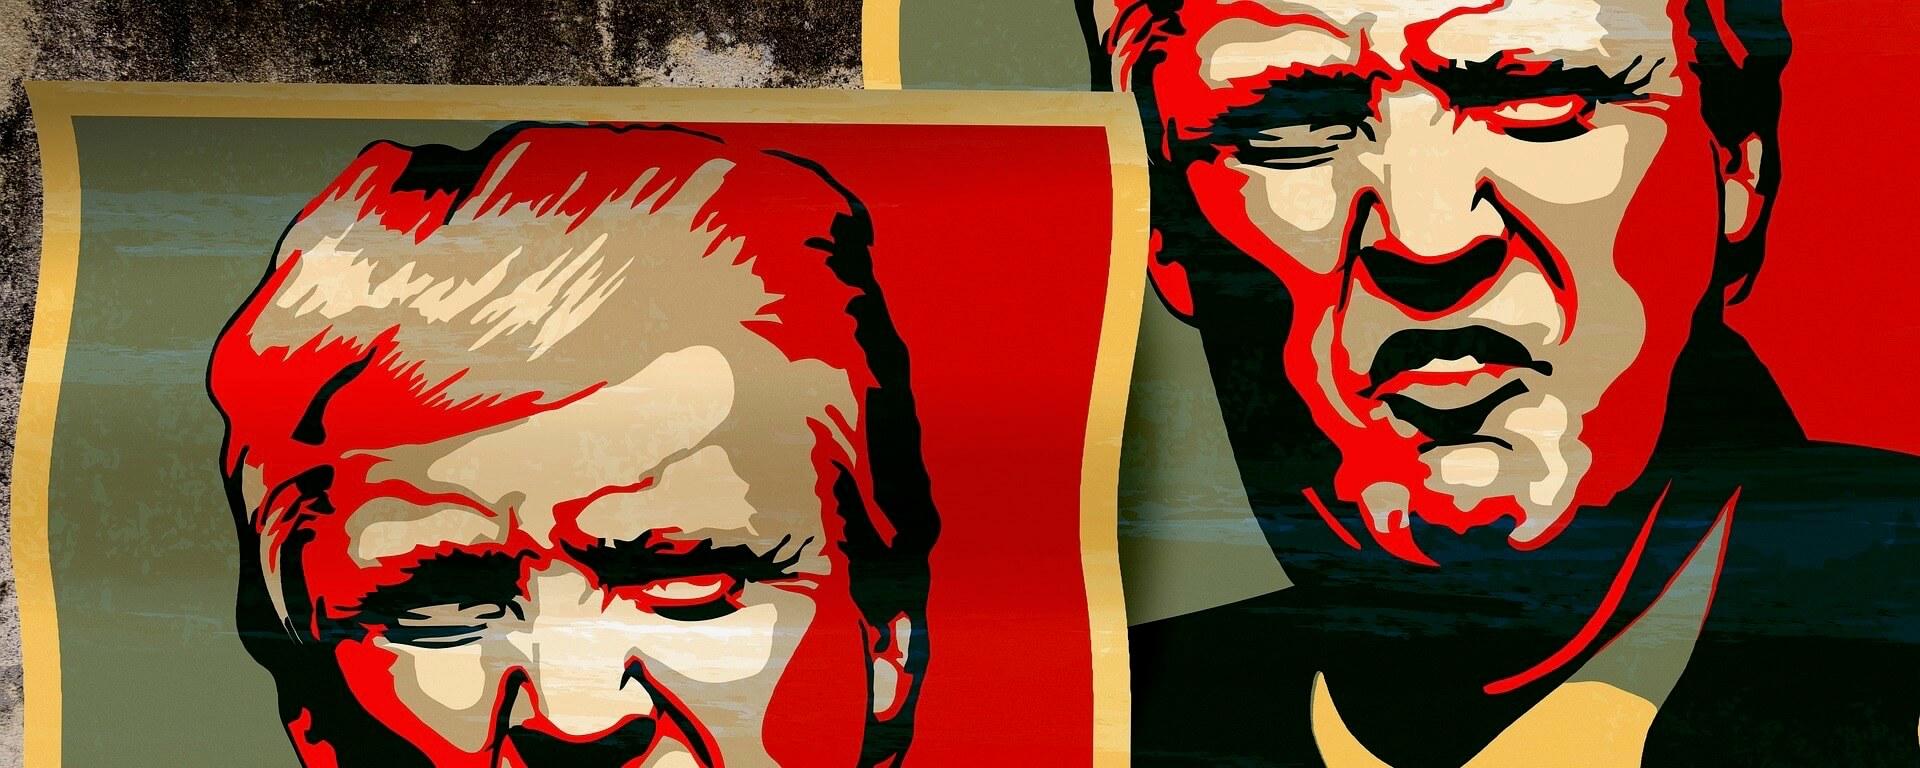 How to Prepare for a Trump PR Crisis